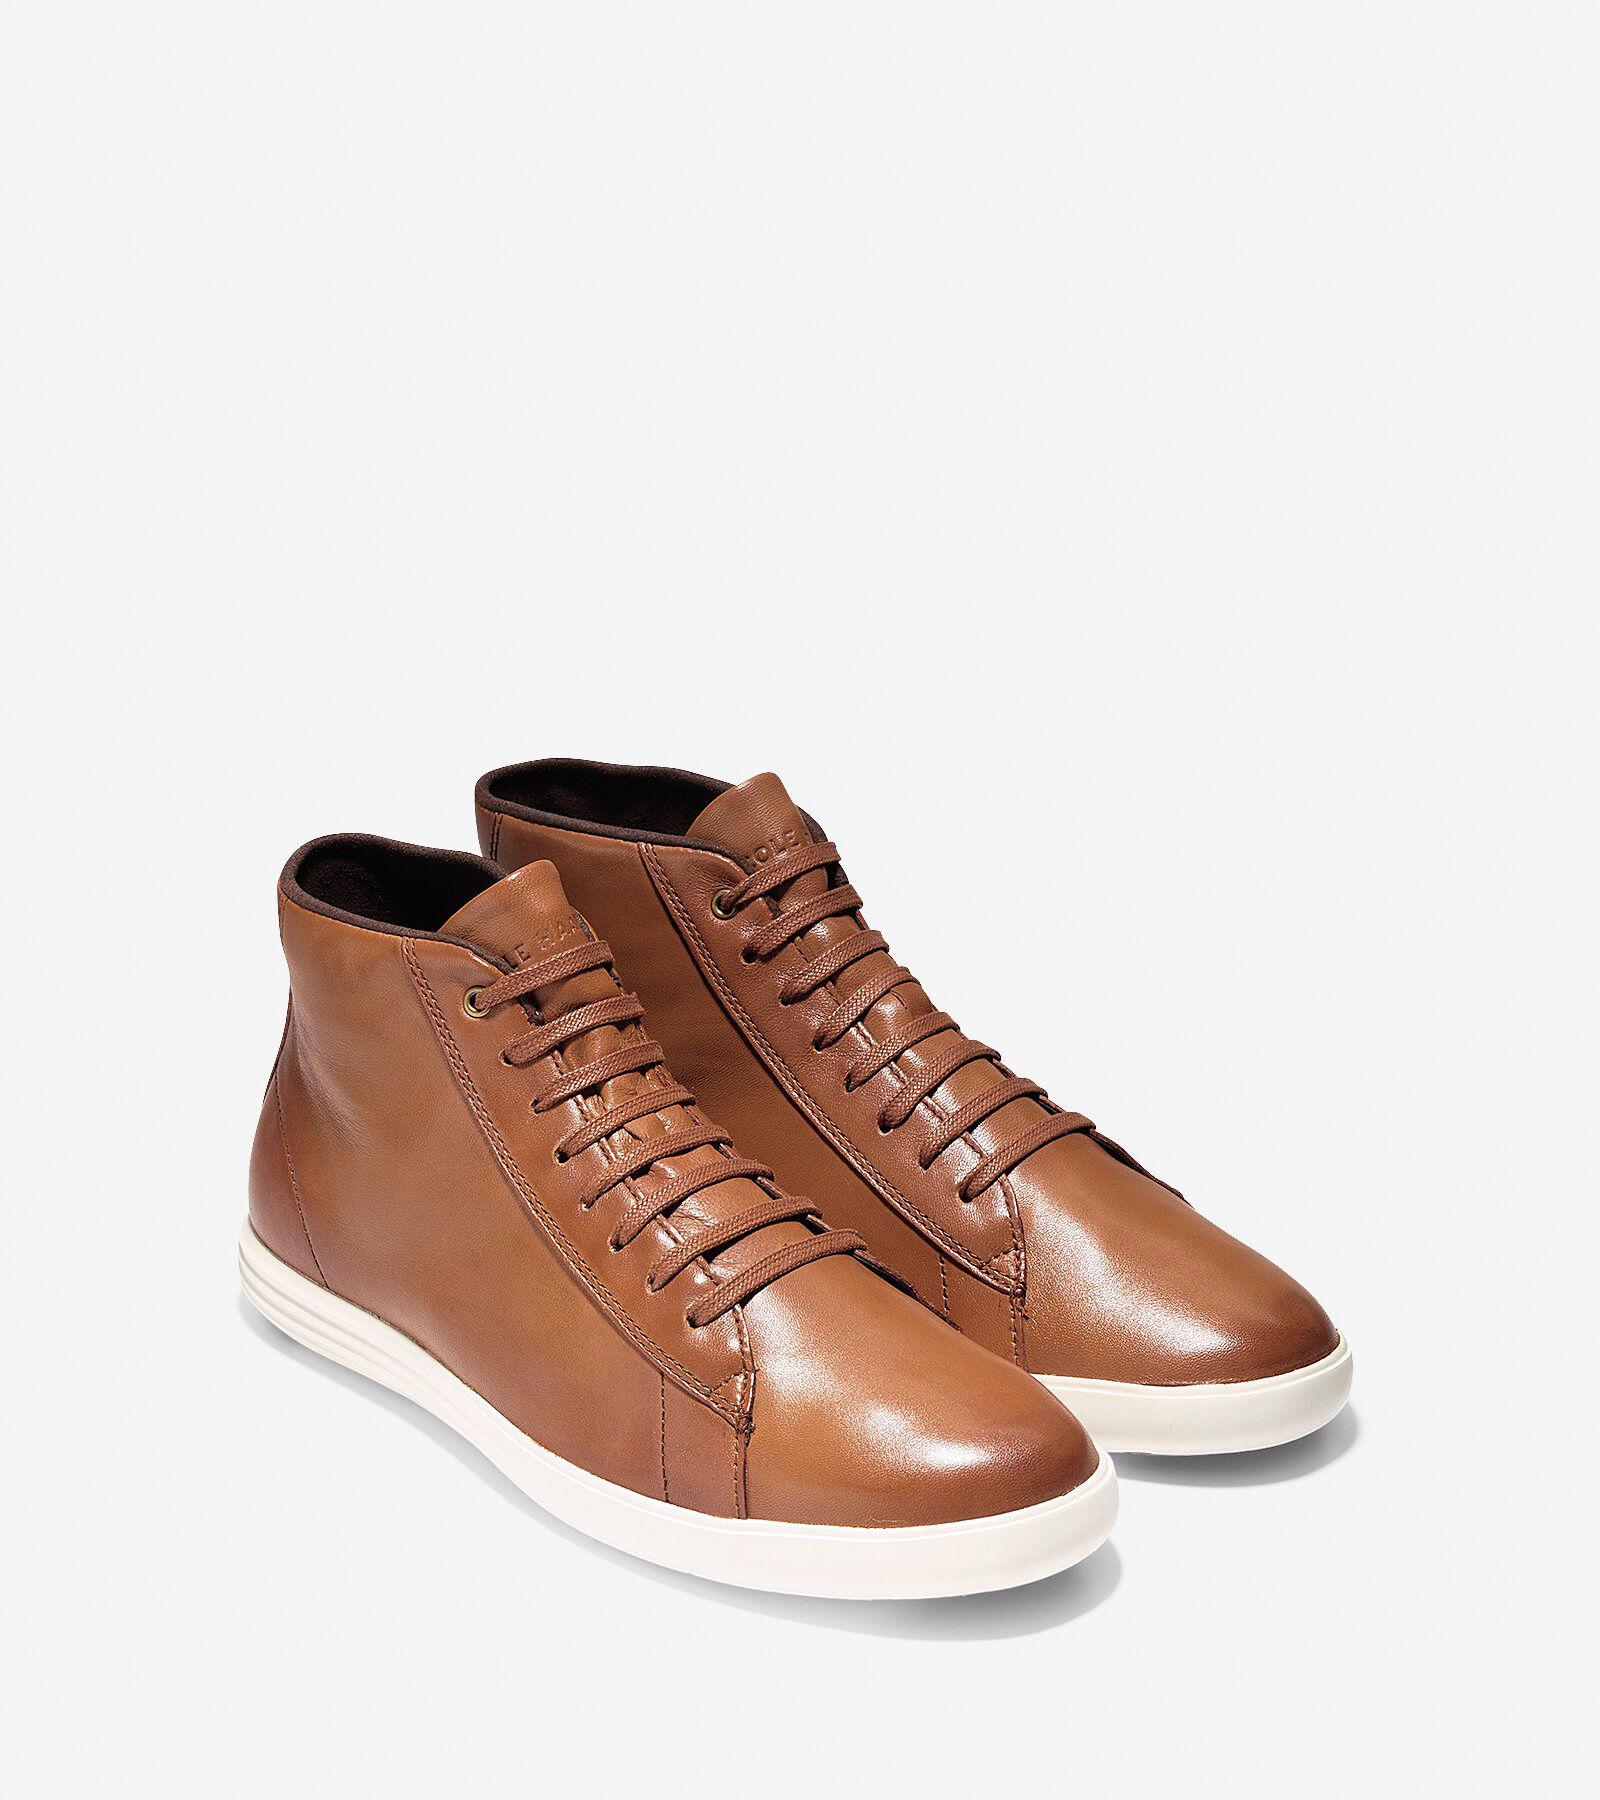 Cole Haan Grand Crosscourt High Top Sneaker aquql